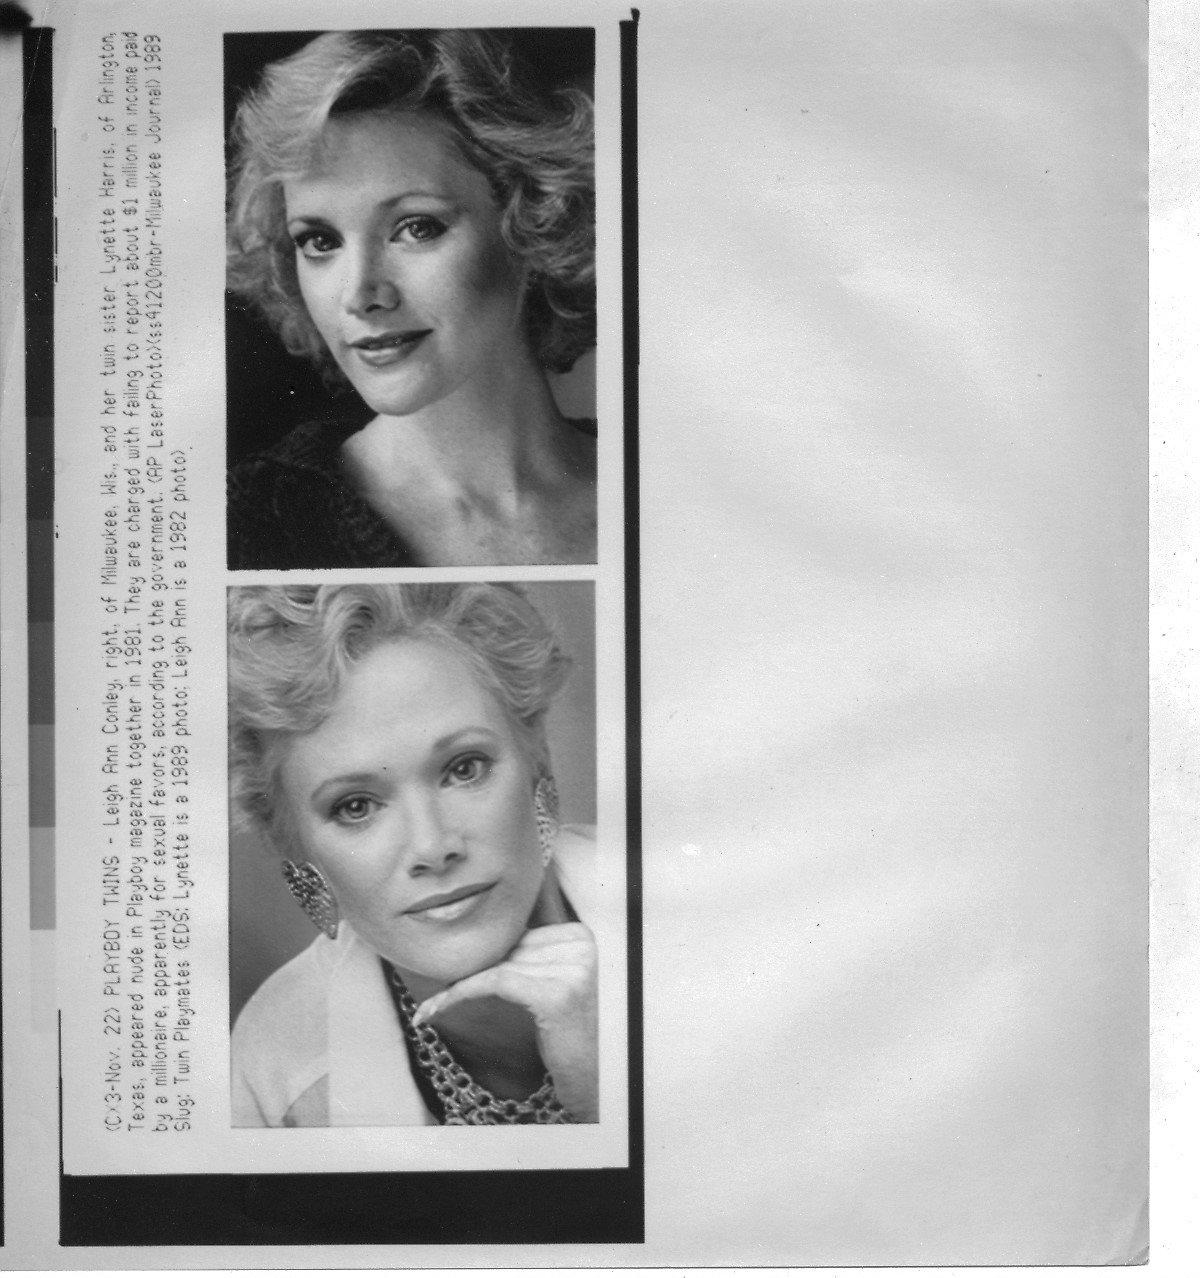 Lynette Harris Nude Photos 6